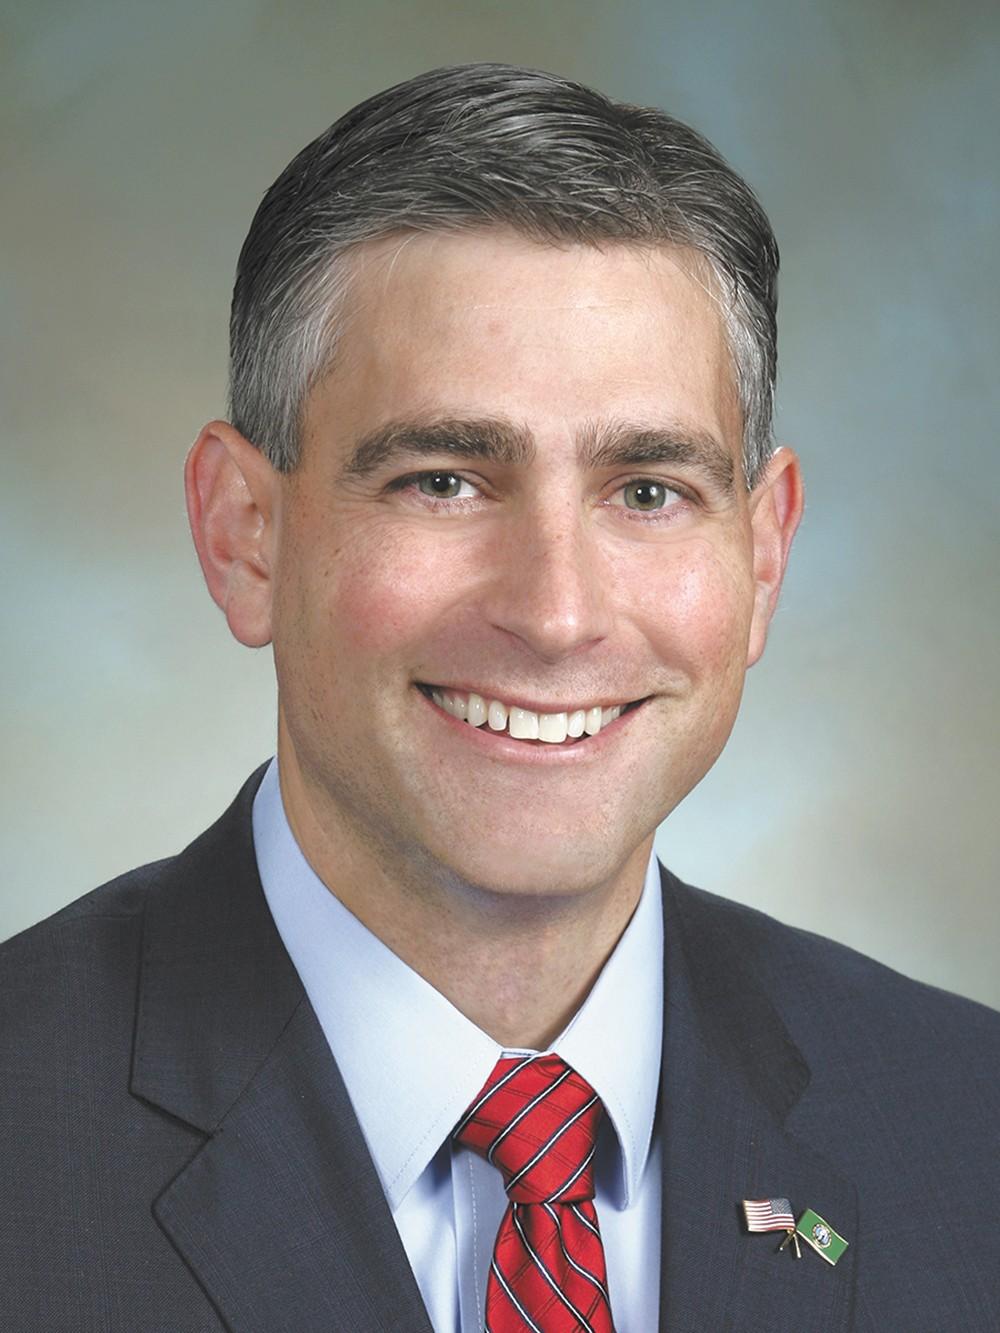 Michael Baumgartner is a Washington state senator representing the 6th District.